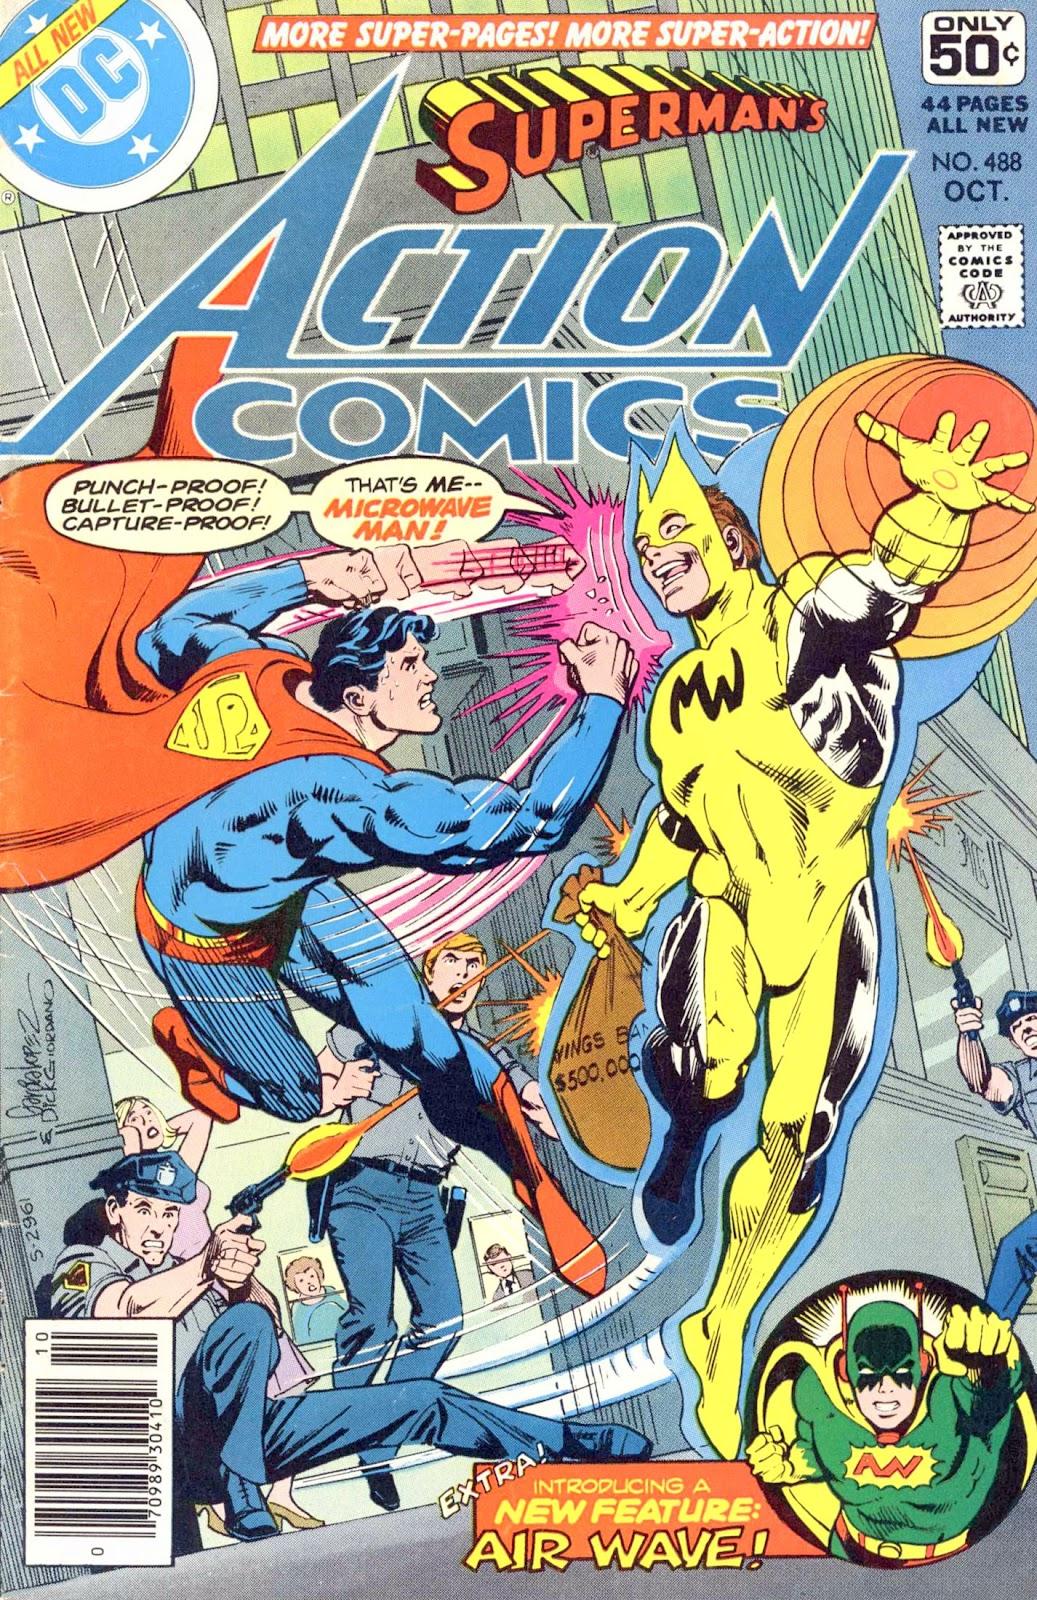 Action Comics (1938) 488 Page 1